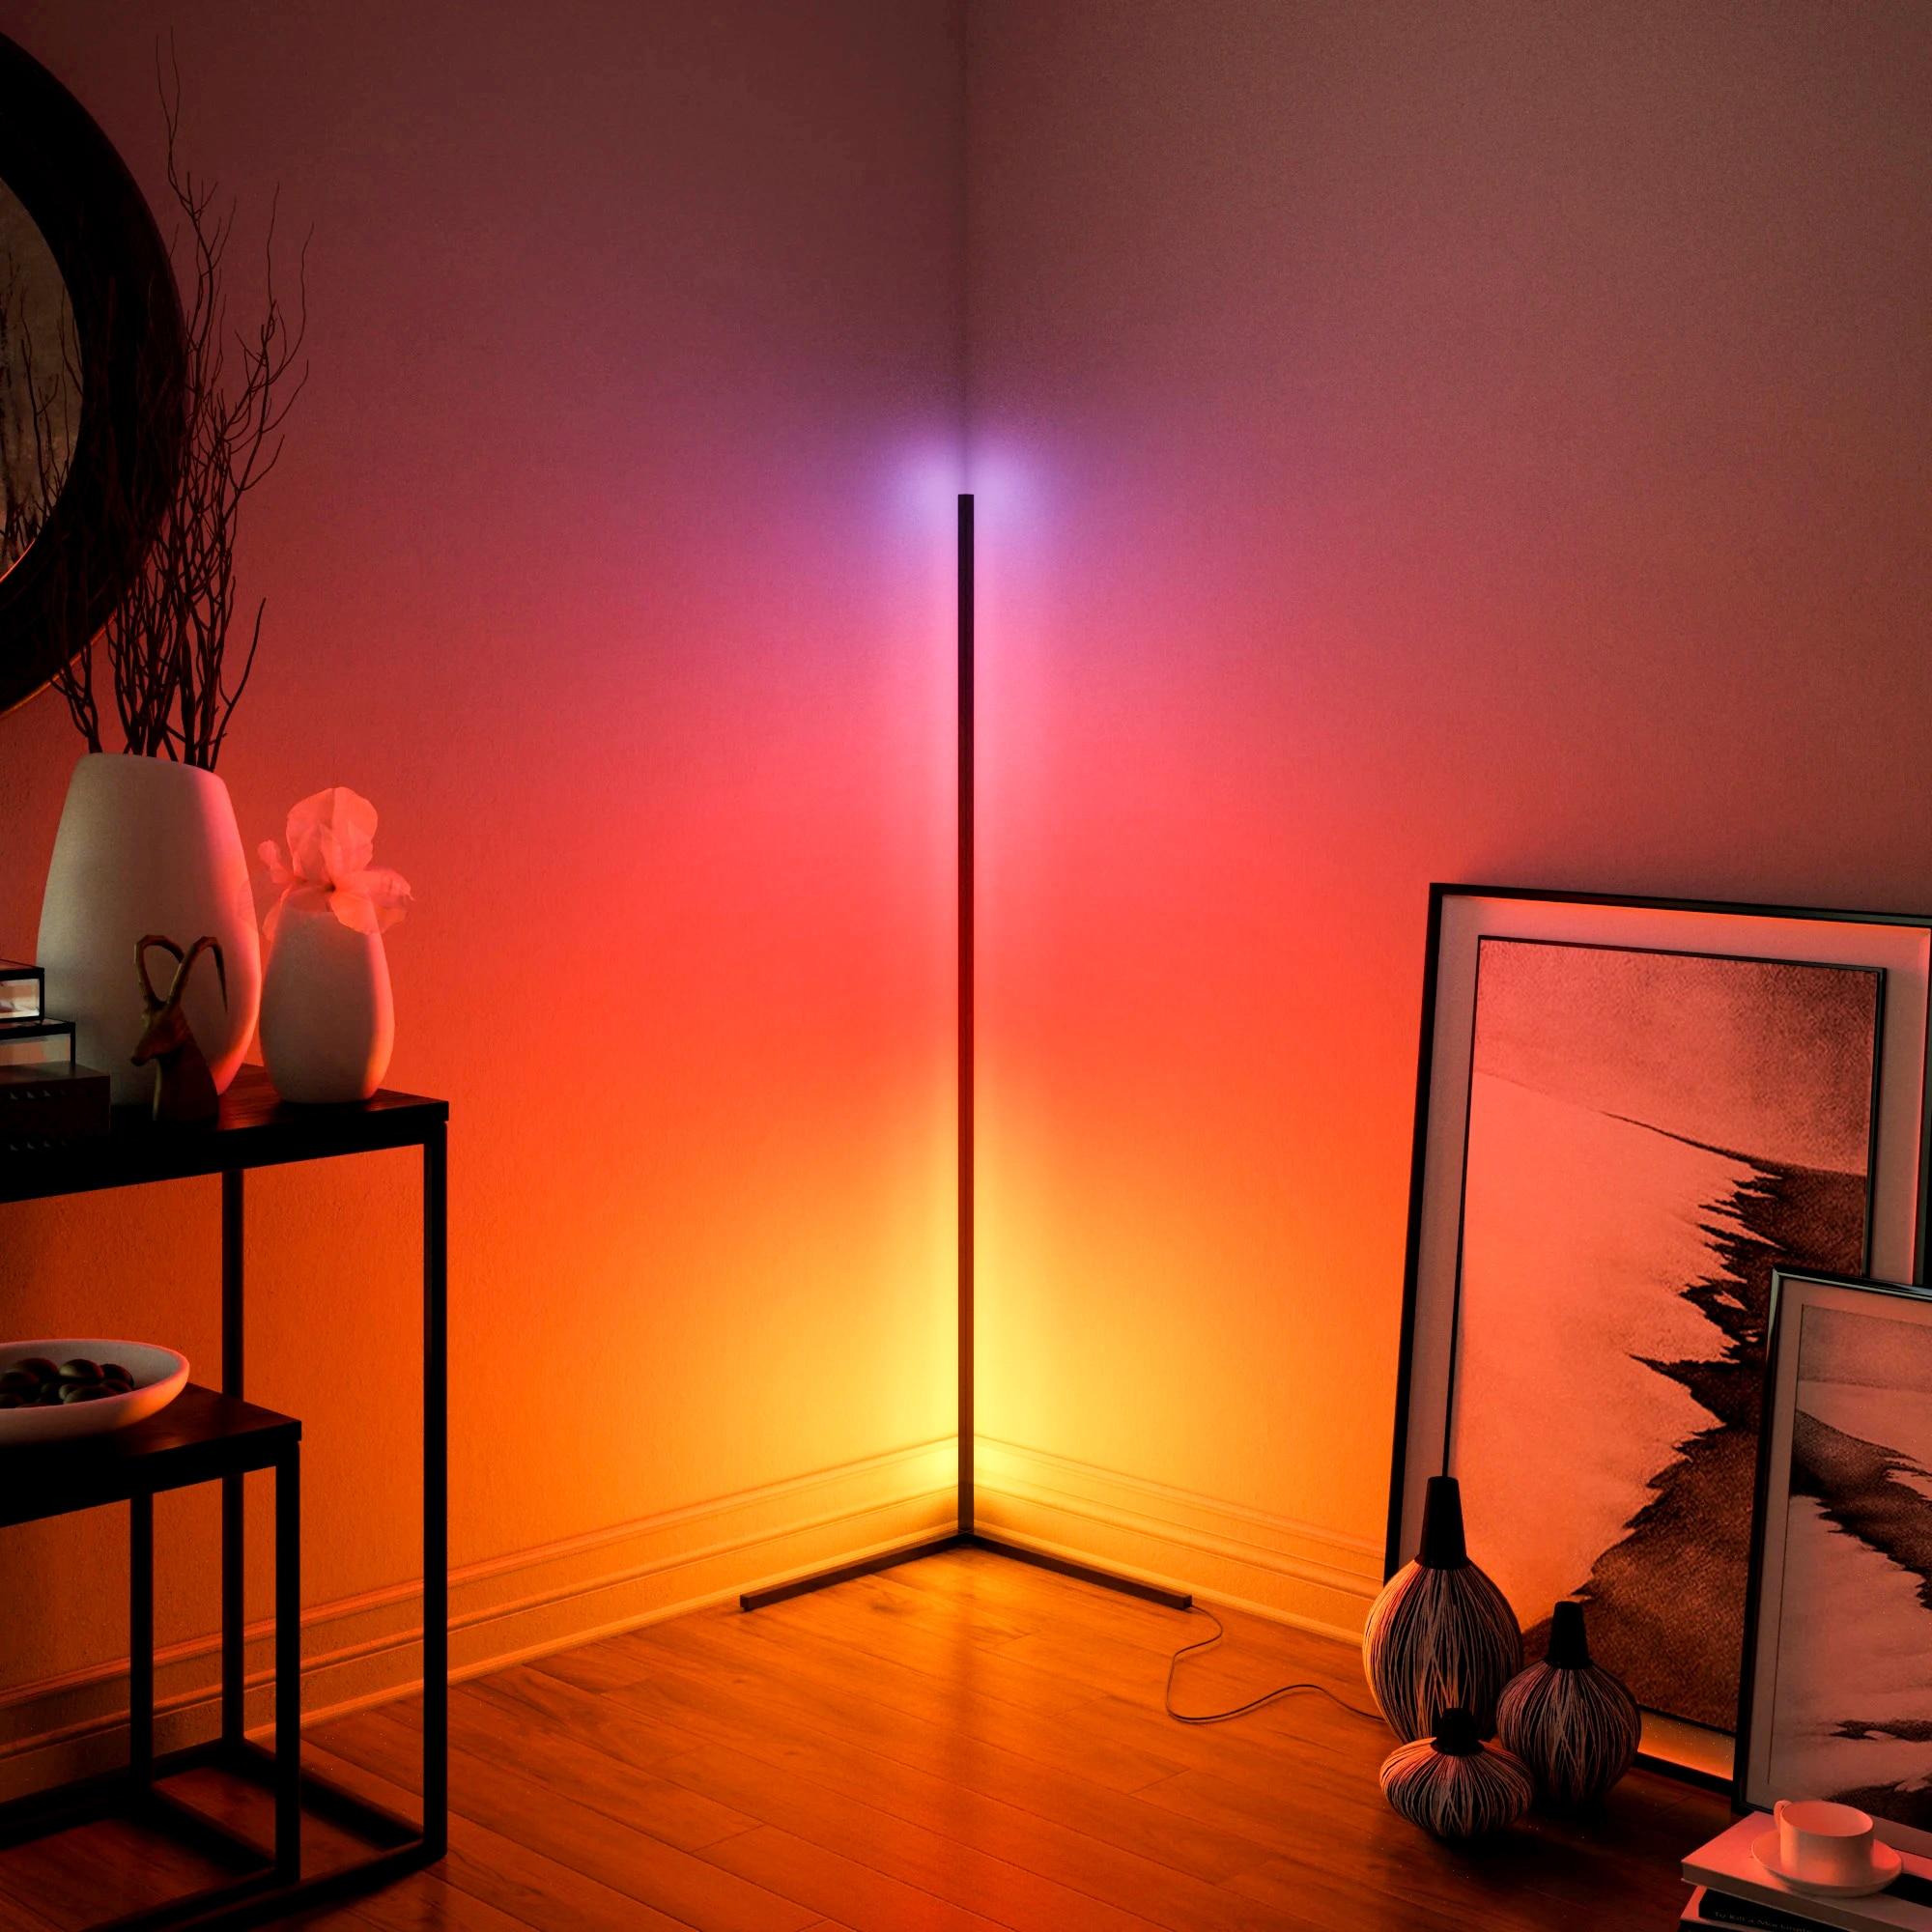 Nordic Corner Floor Lamps Bright Light Interior Atmosphere Lamp Colourful Bedroom Living Room Decoration Lighting Standing Lamp Floor Lamps Aliexpress